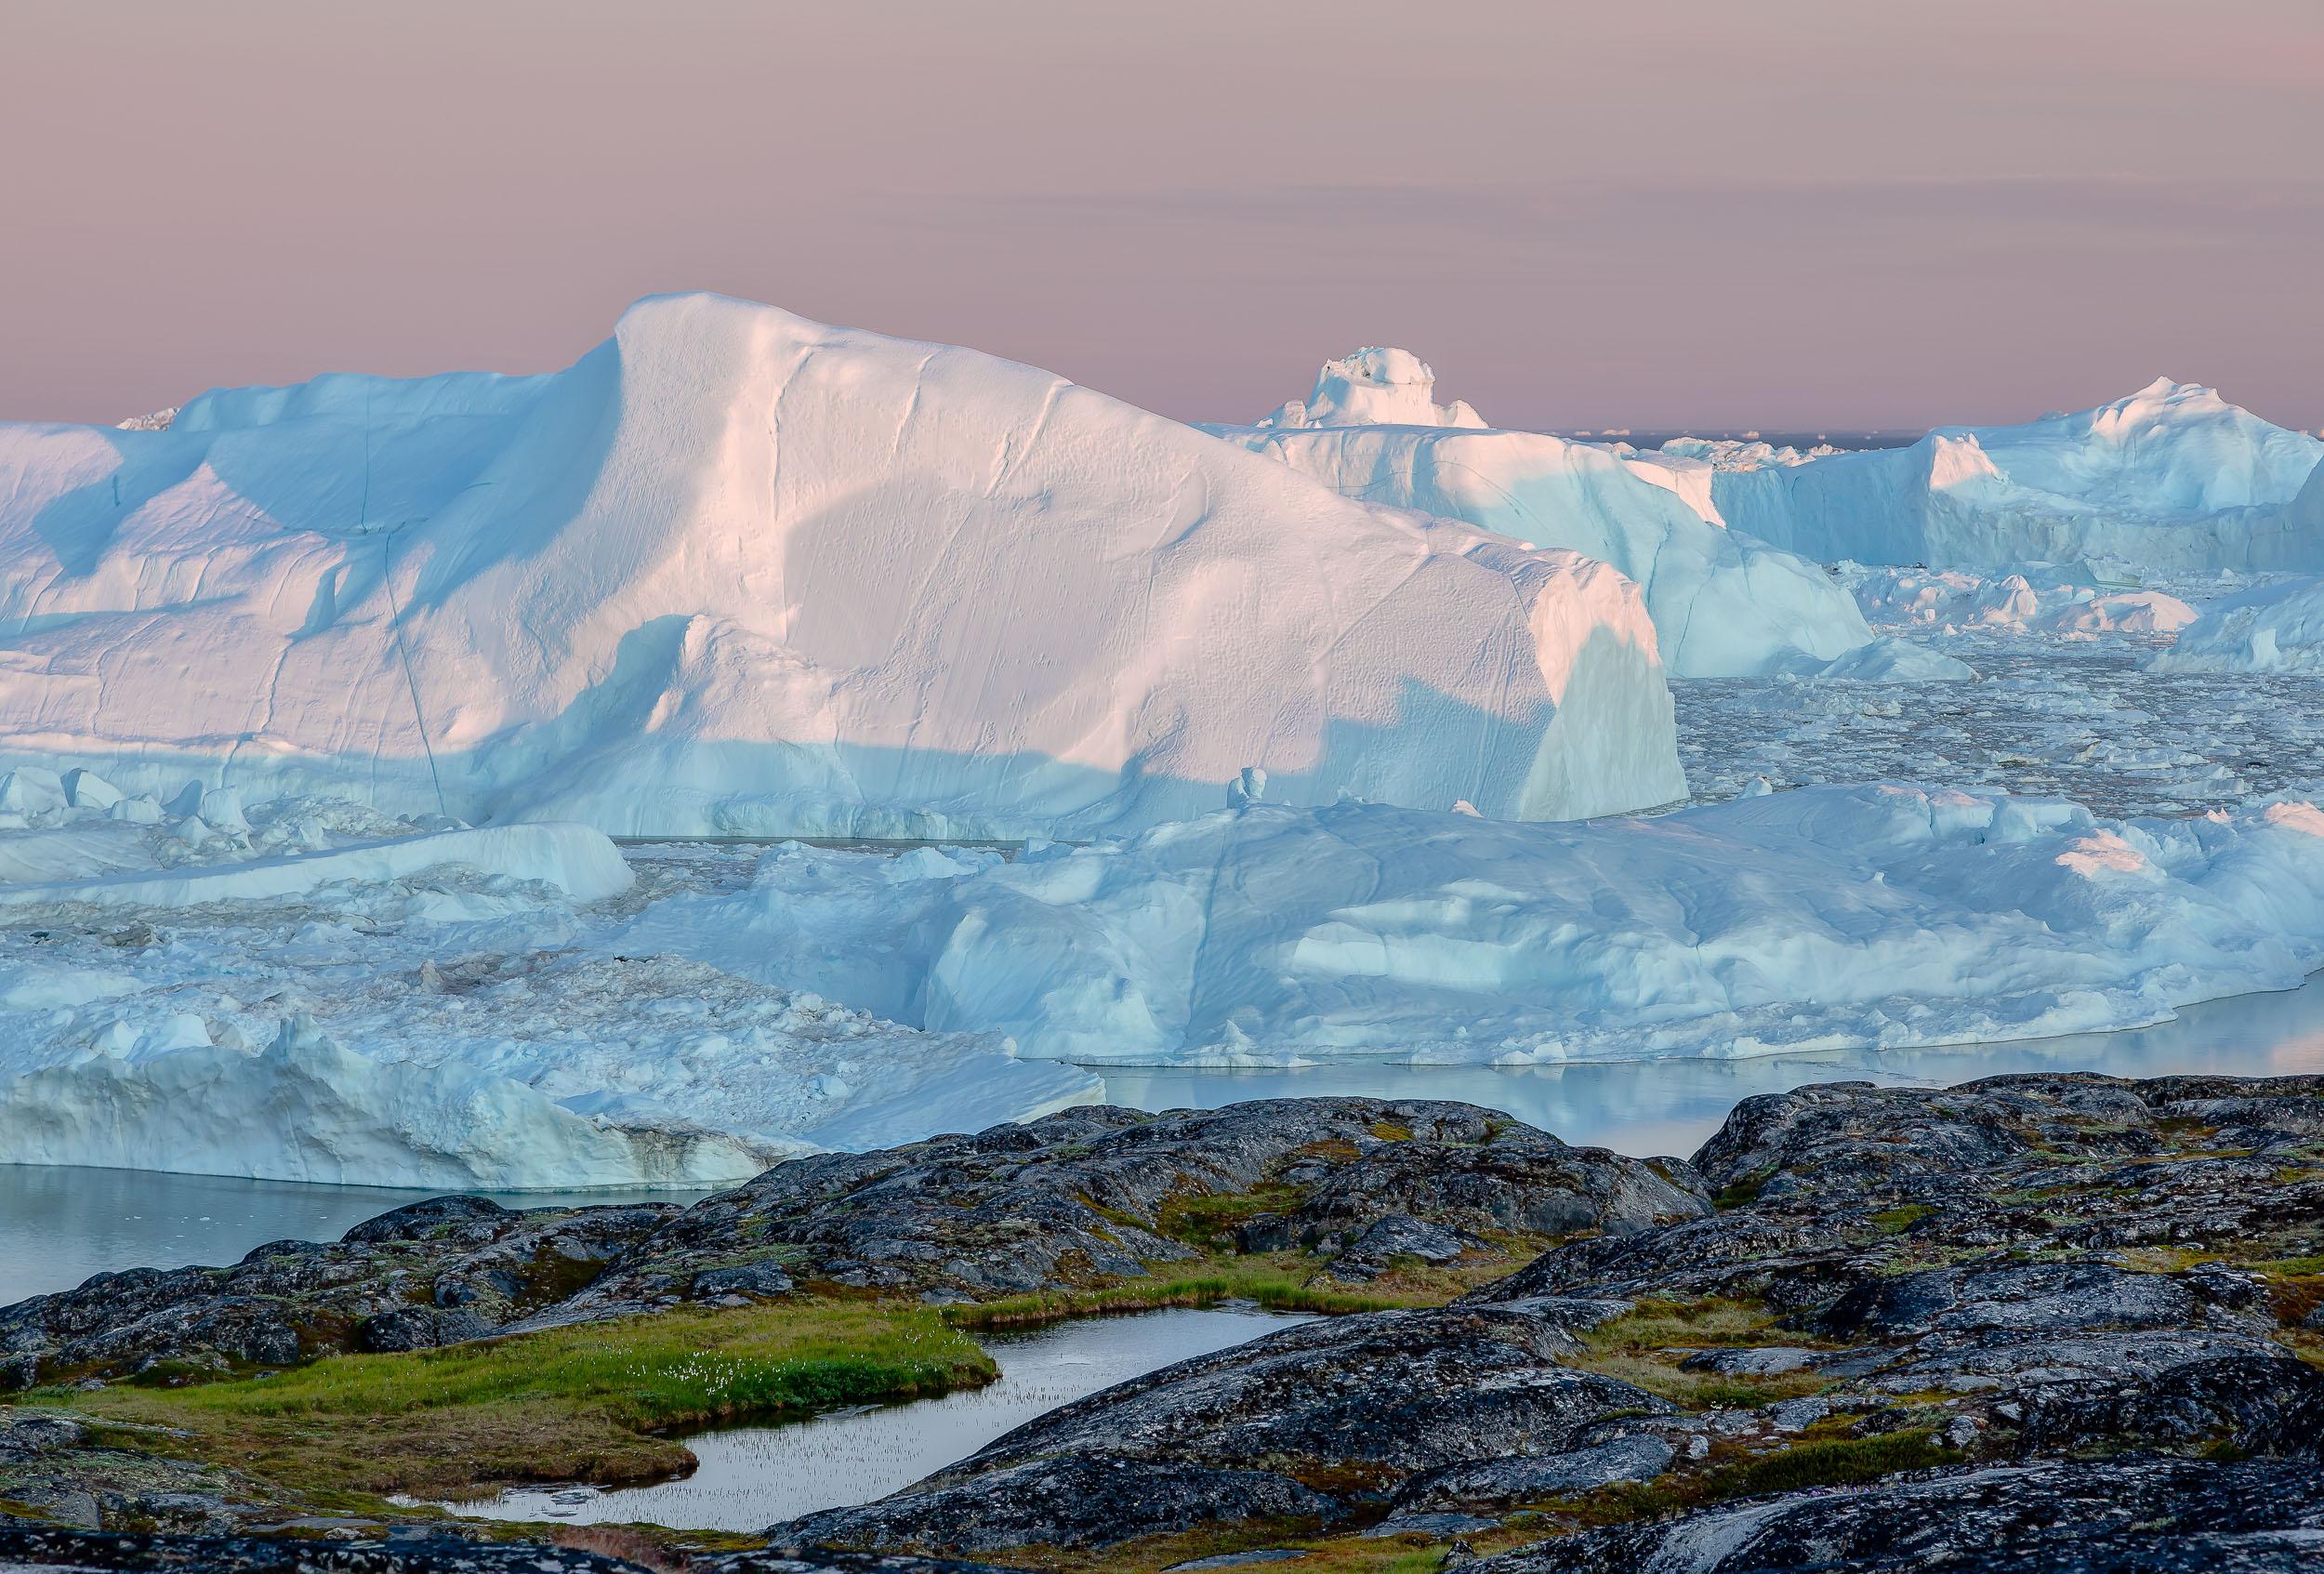 Delicate light illuminates a    gigantic iceberg    on the edge of the    Ilulissat Icefjord    in    Greenland   .